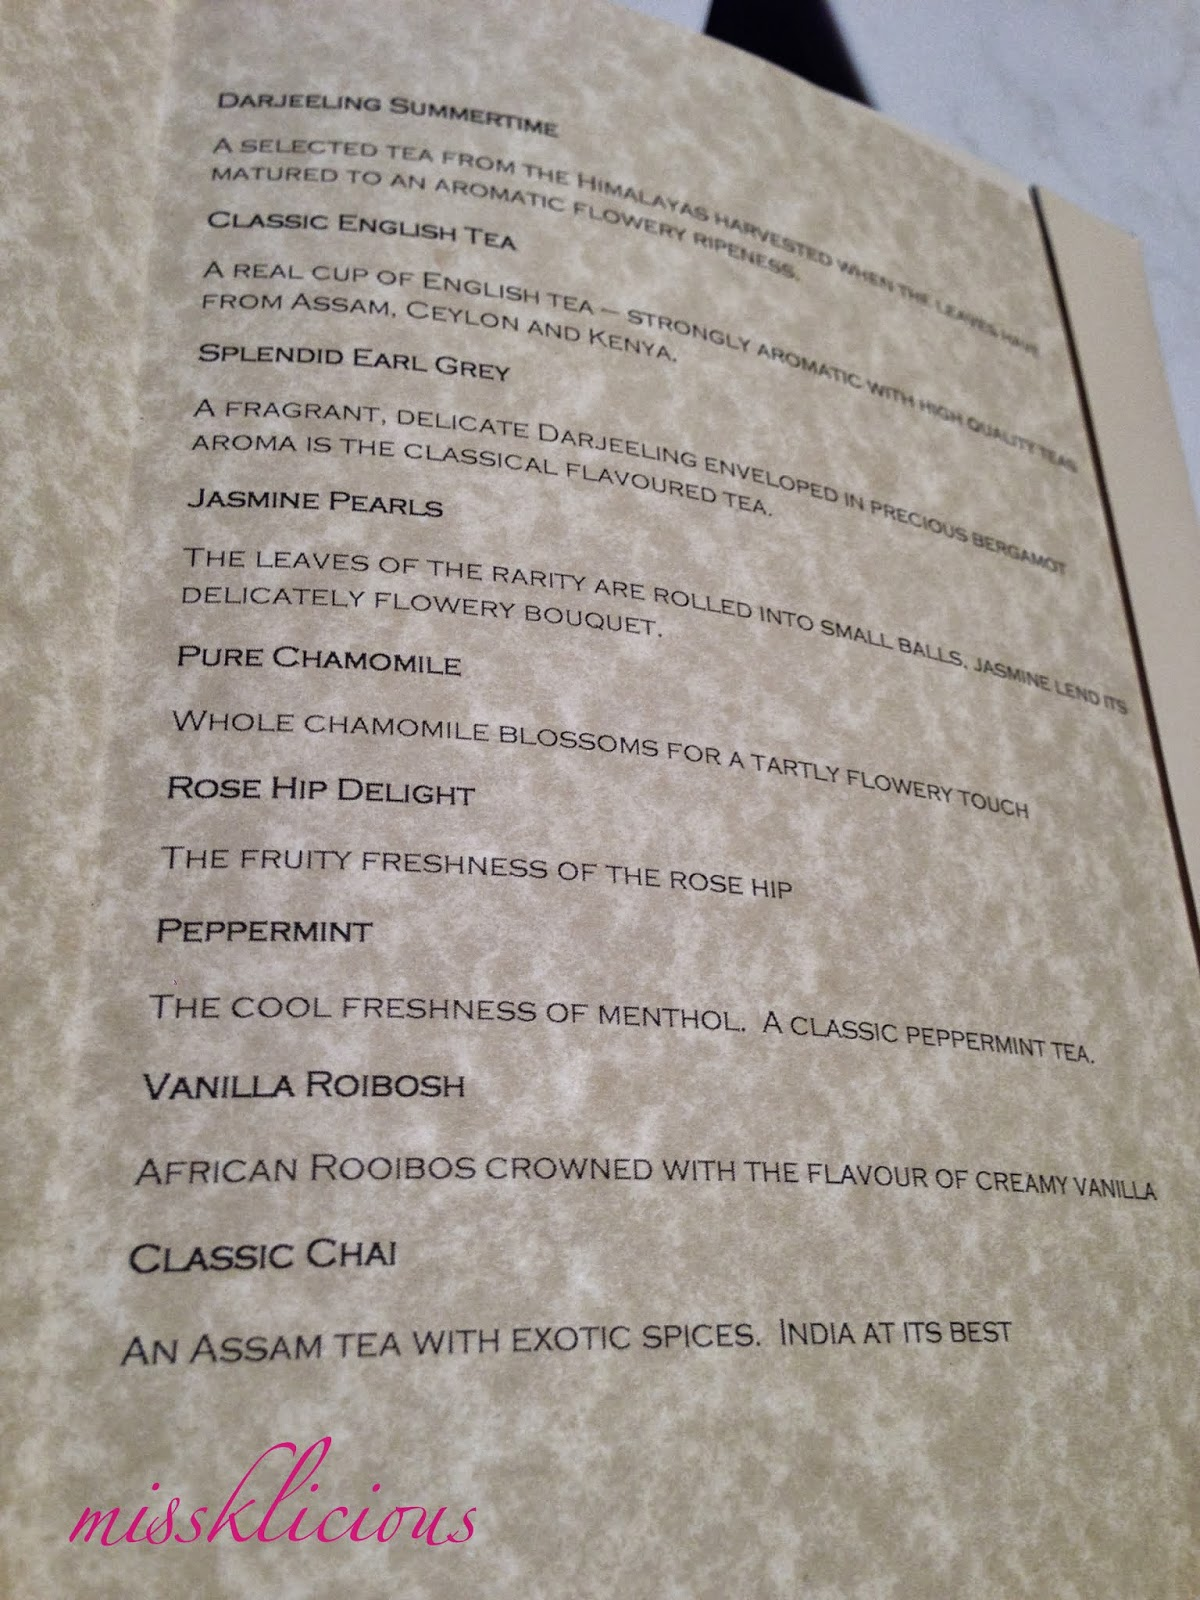 sofitel sydney pillow menu - photo#28